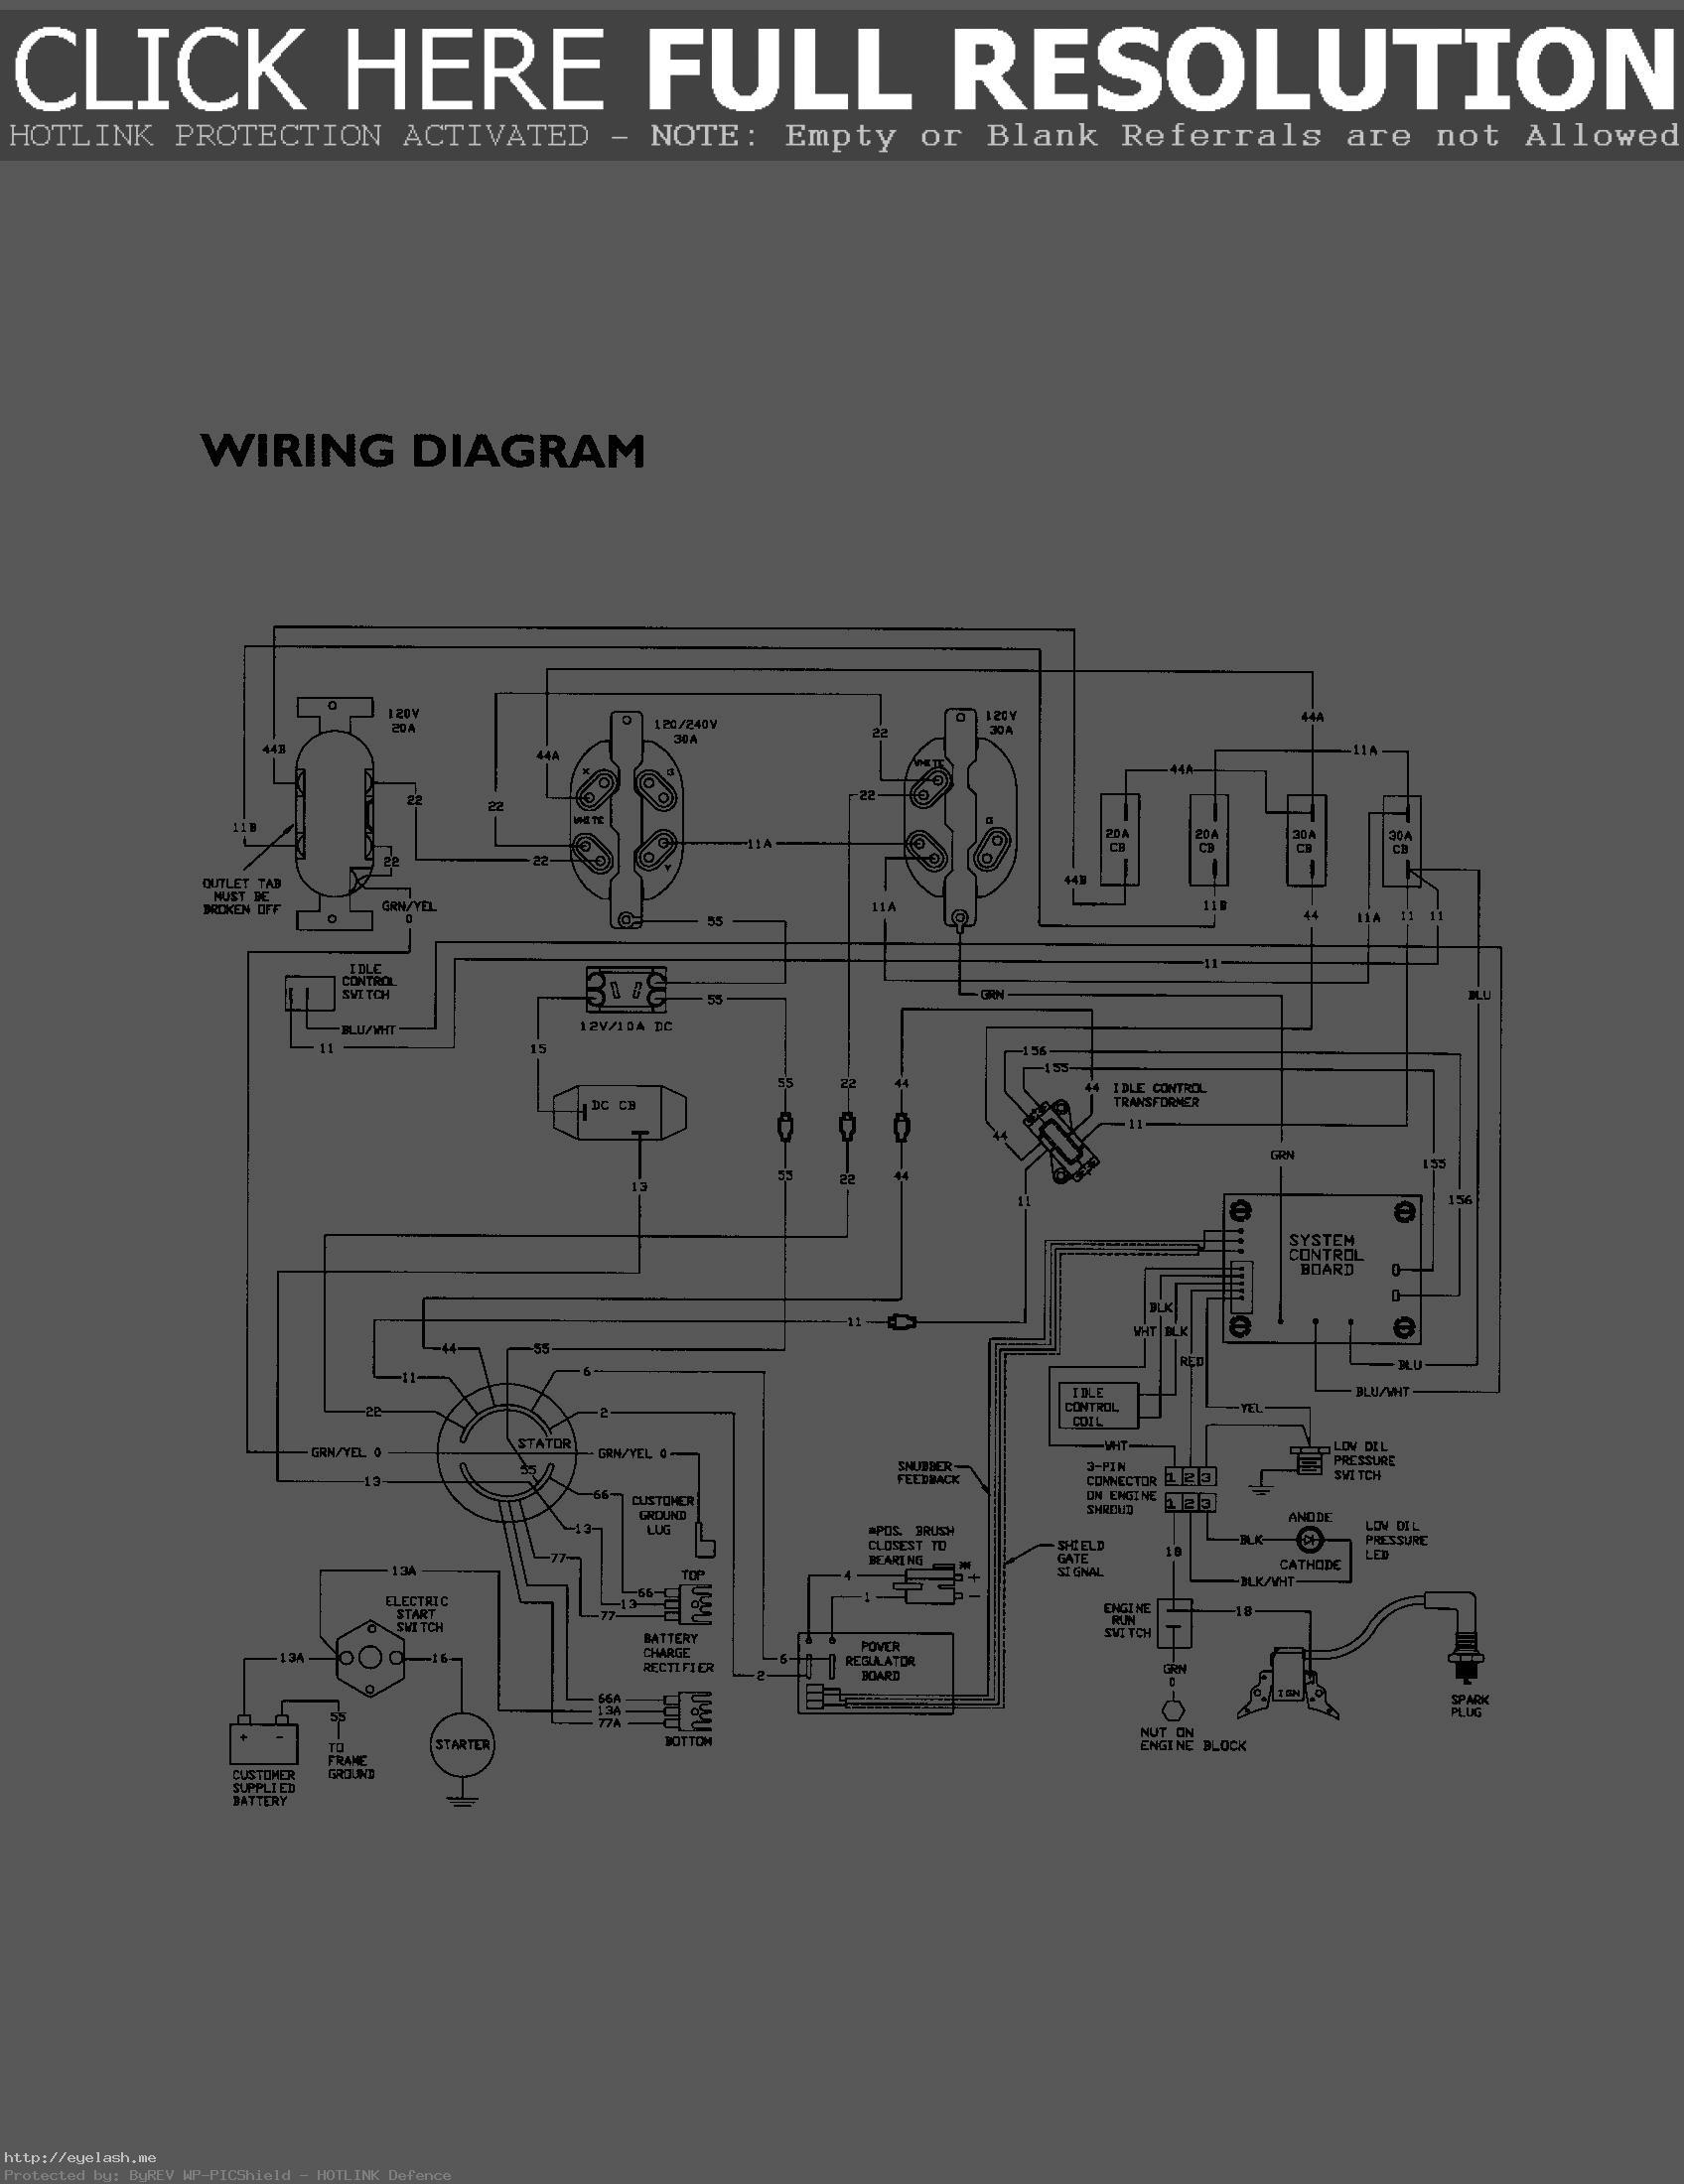 [SCHEMATICS_48ZD]  WT_1586] Wiring Diagram Starter 6500Gp Generac Schematic Wiring | Wiring Diagram Starter 6500gp Generac |  | Socad Alma Adit Gue45 Mohammedshrine Librar Wiring 101